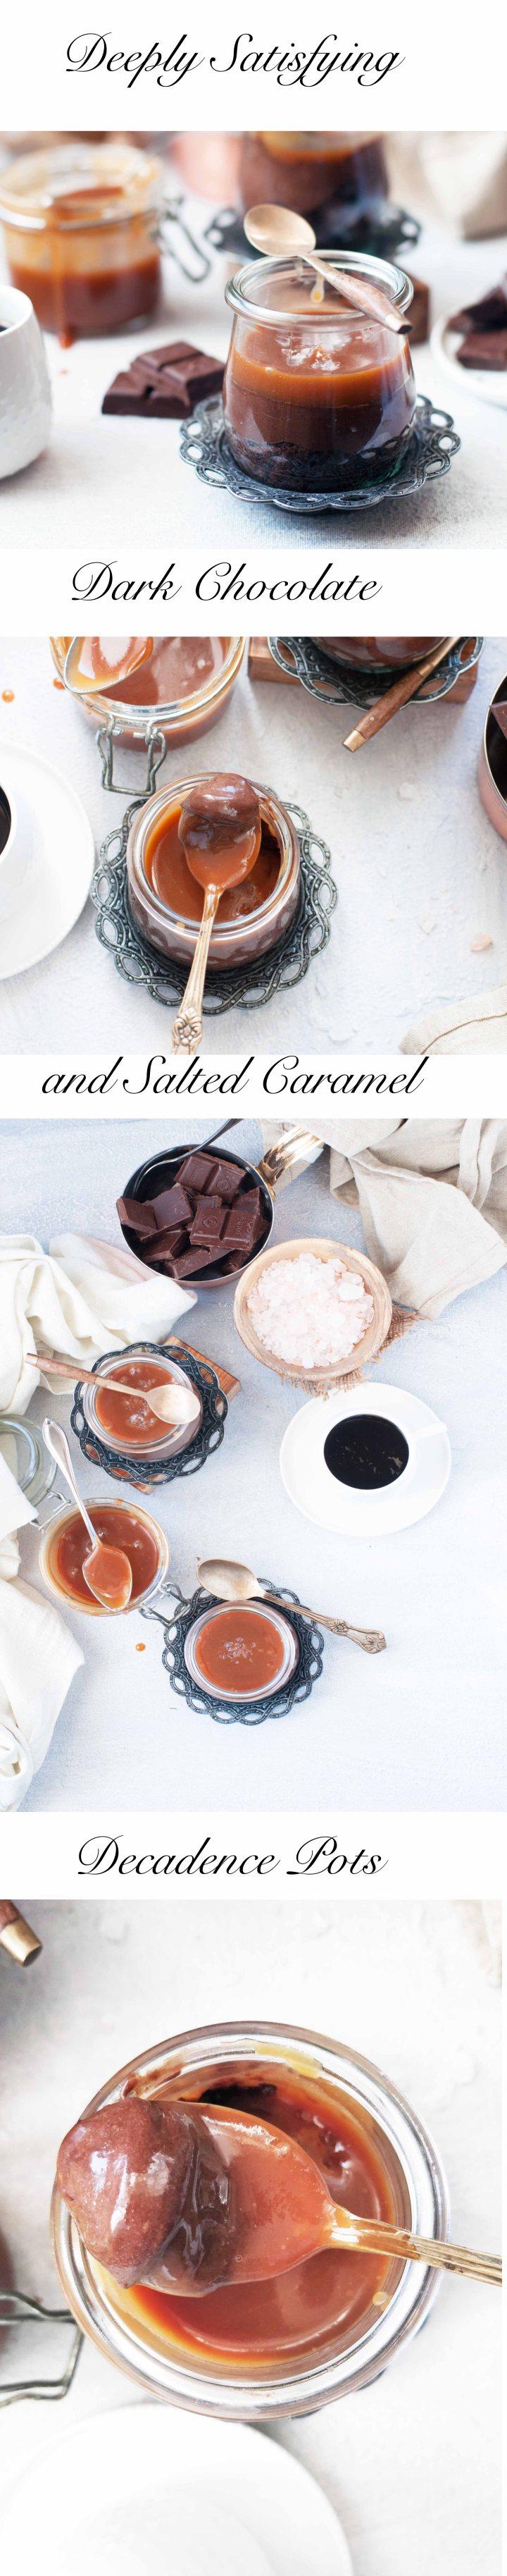 Dark Chocolate Cake,Chocolate ganache and Caramel Pots